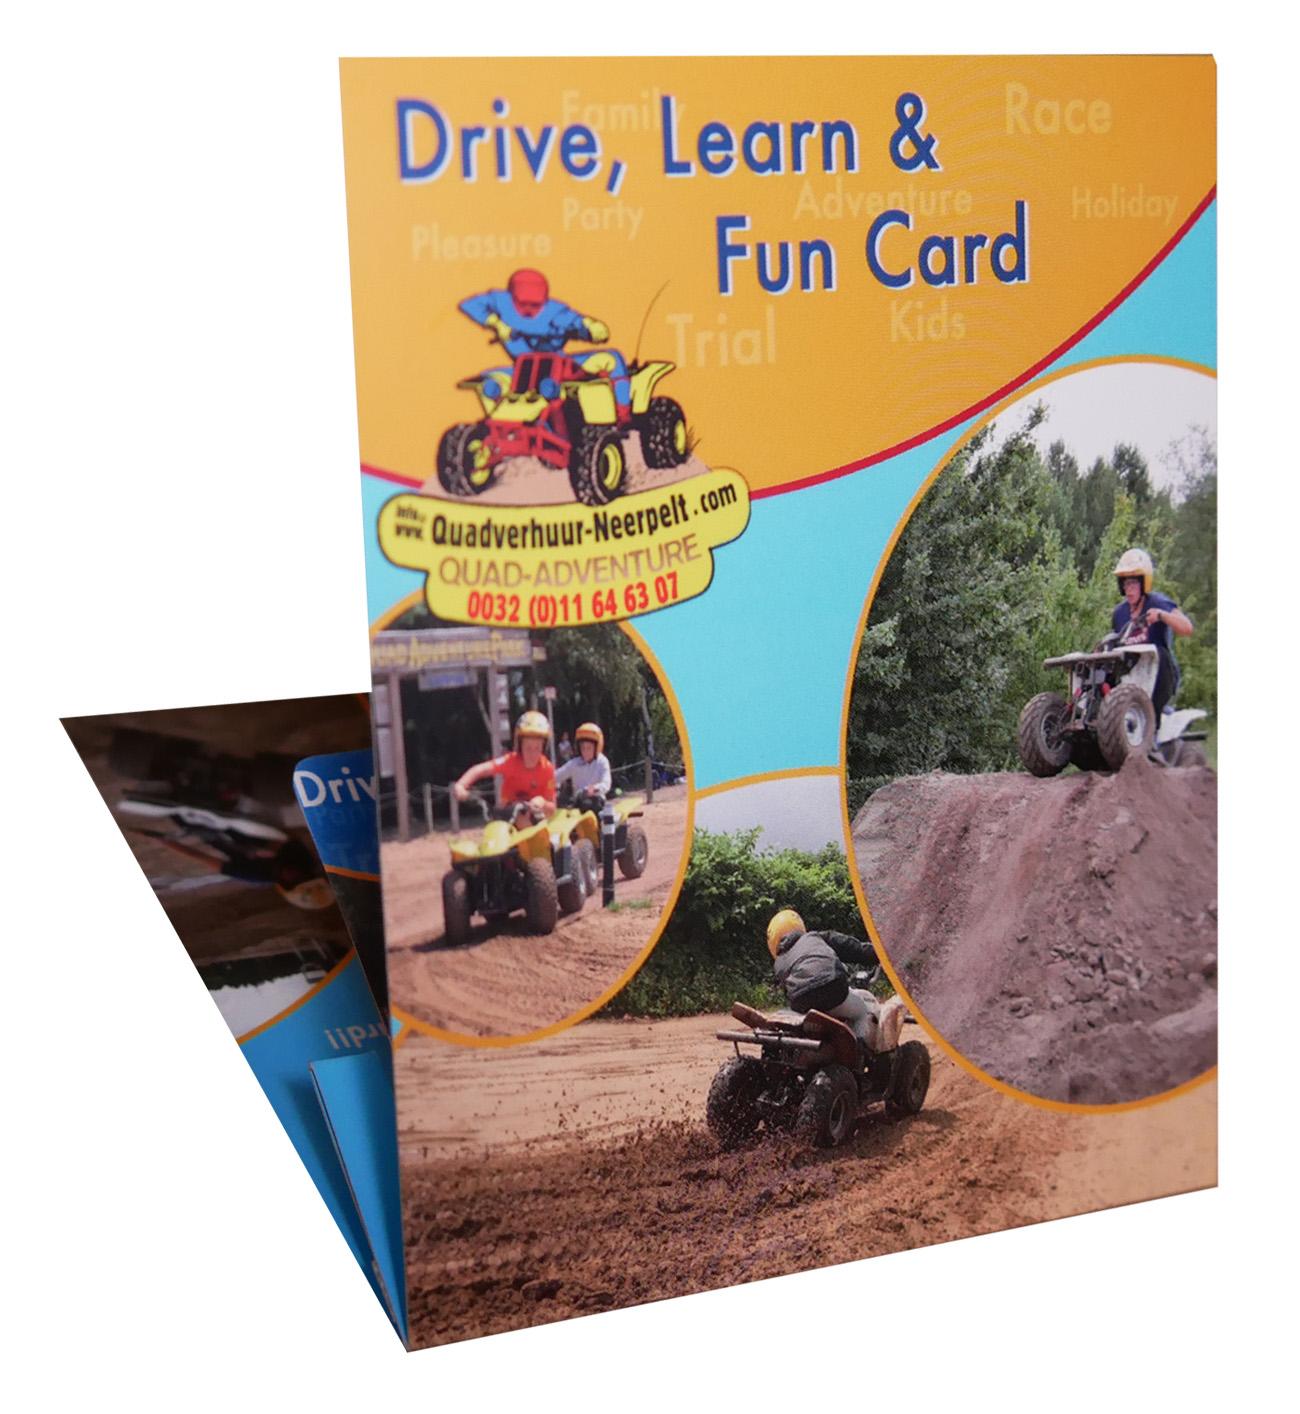 Quadrijden cadeaubon drive learn fun card